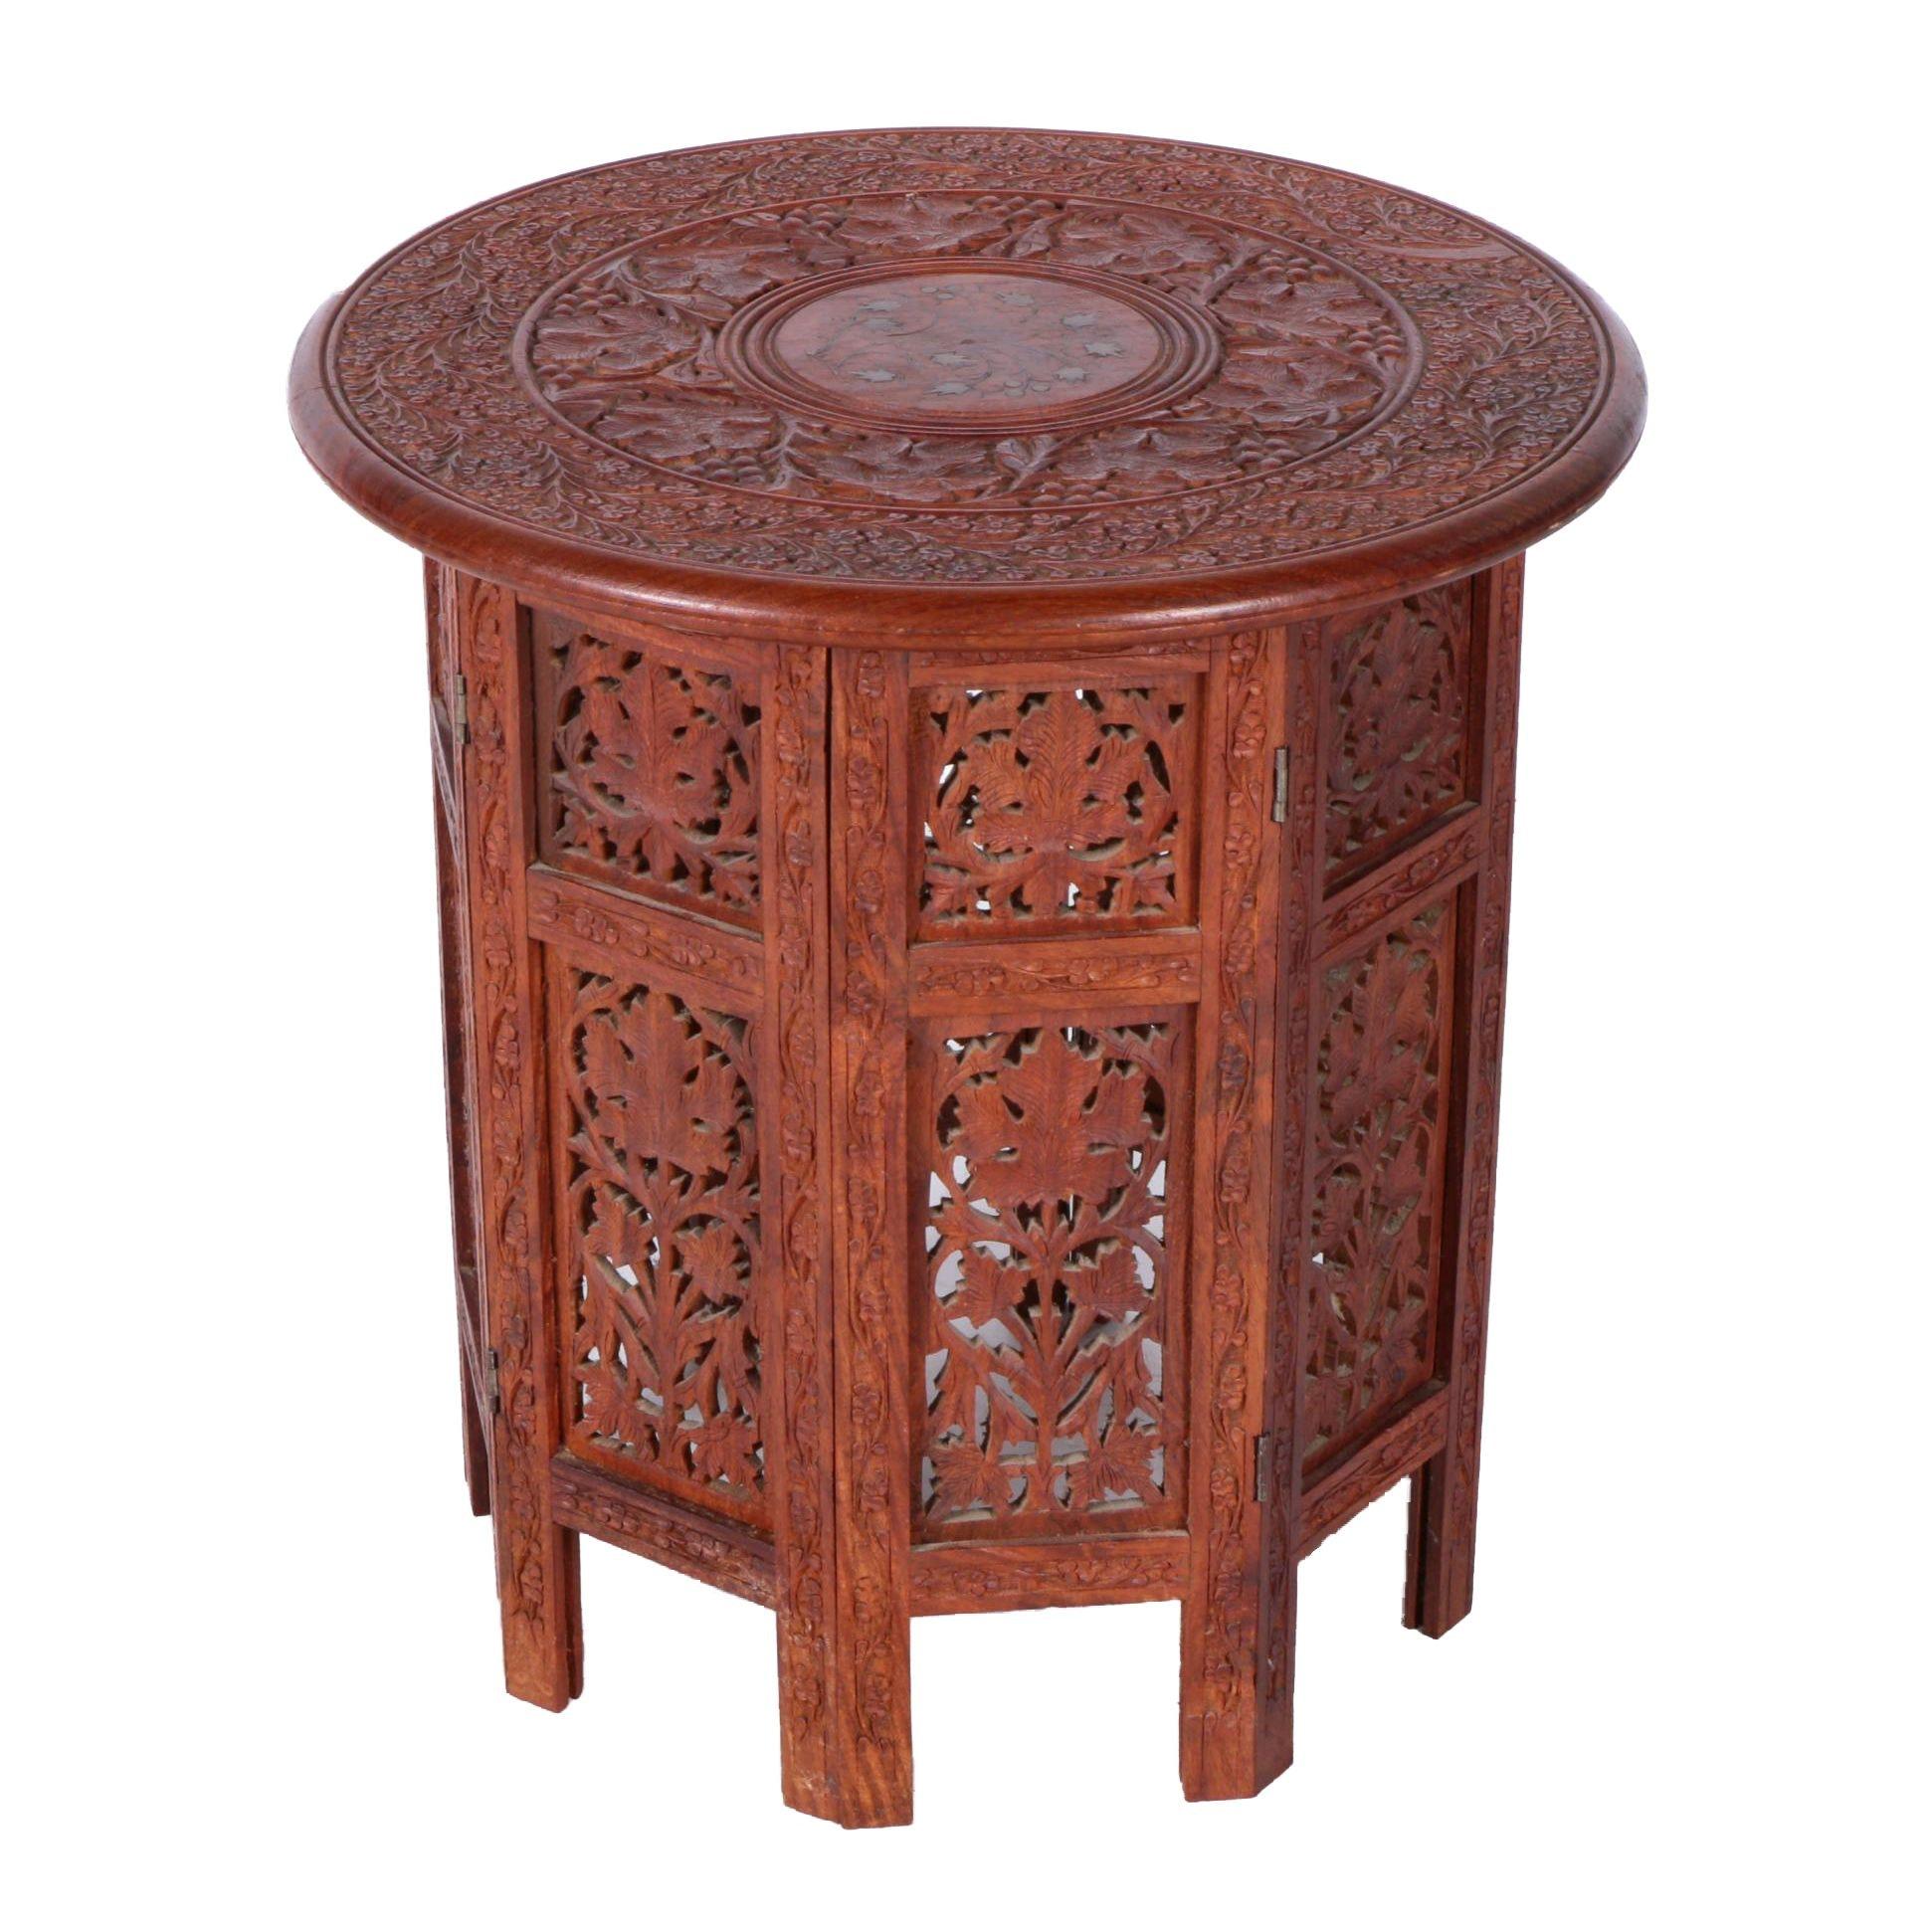 Carved Indian Teak Table